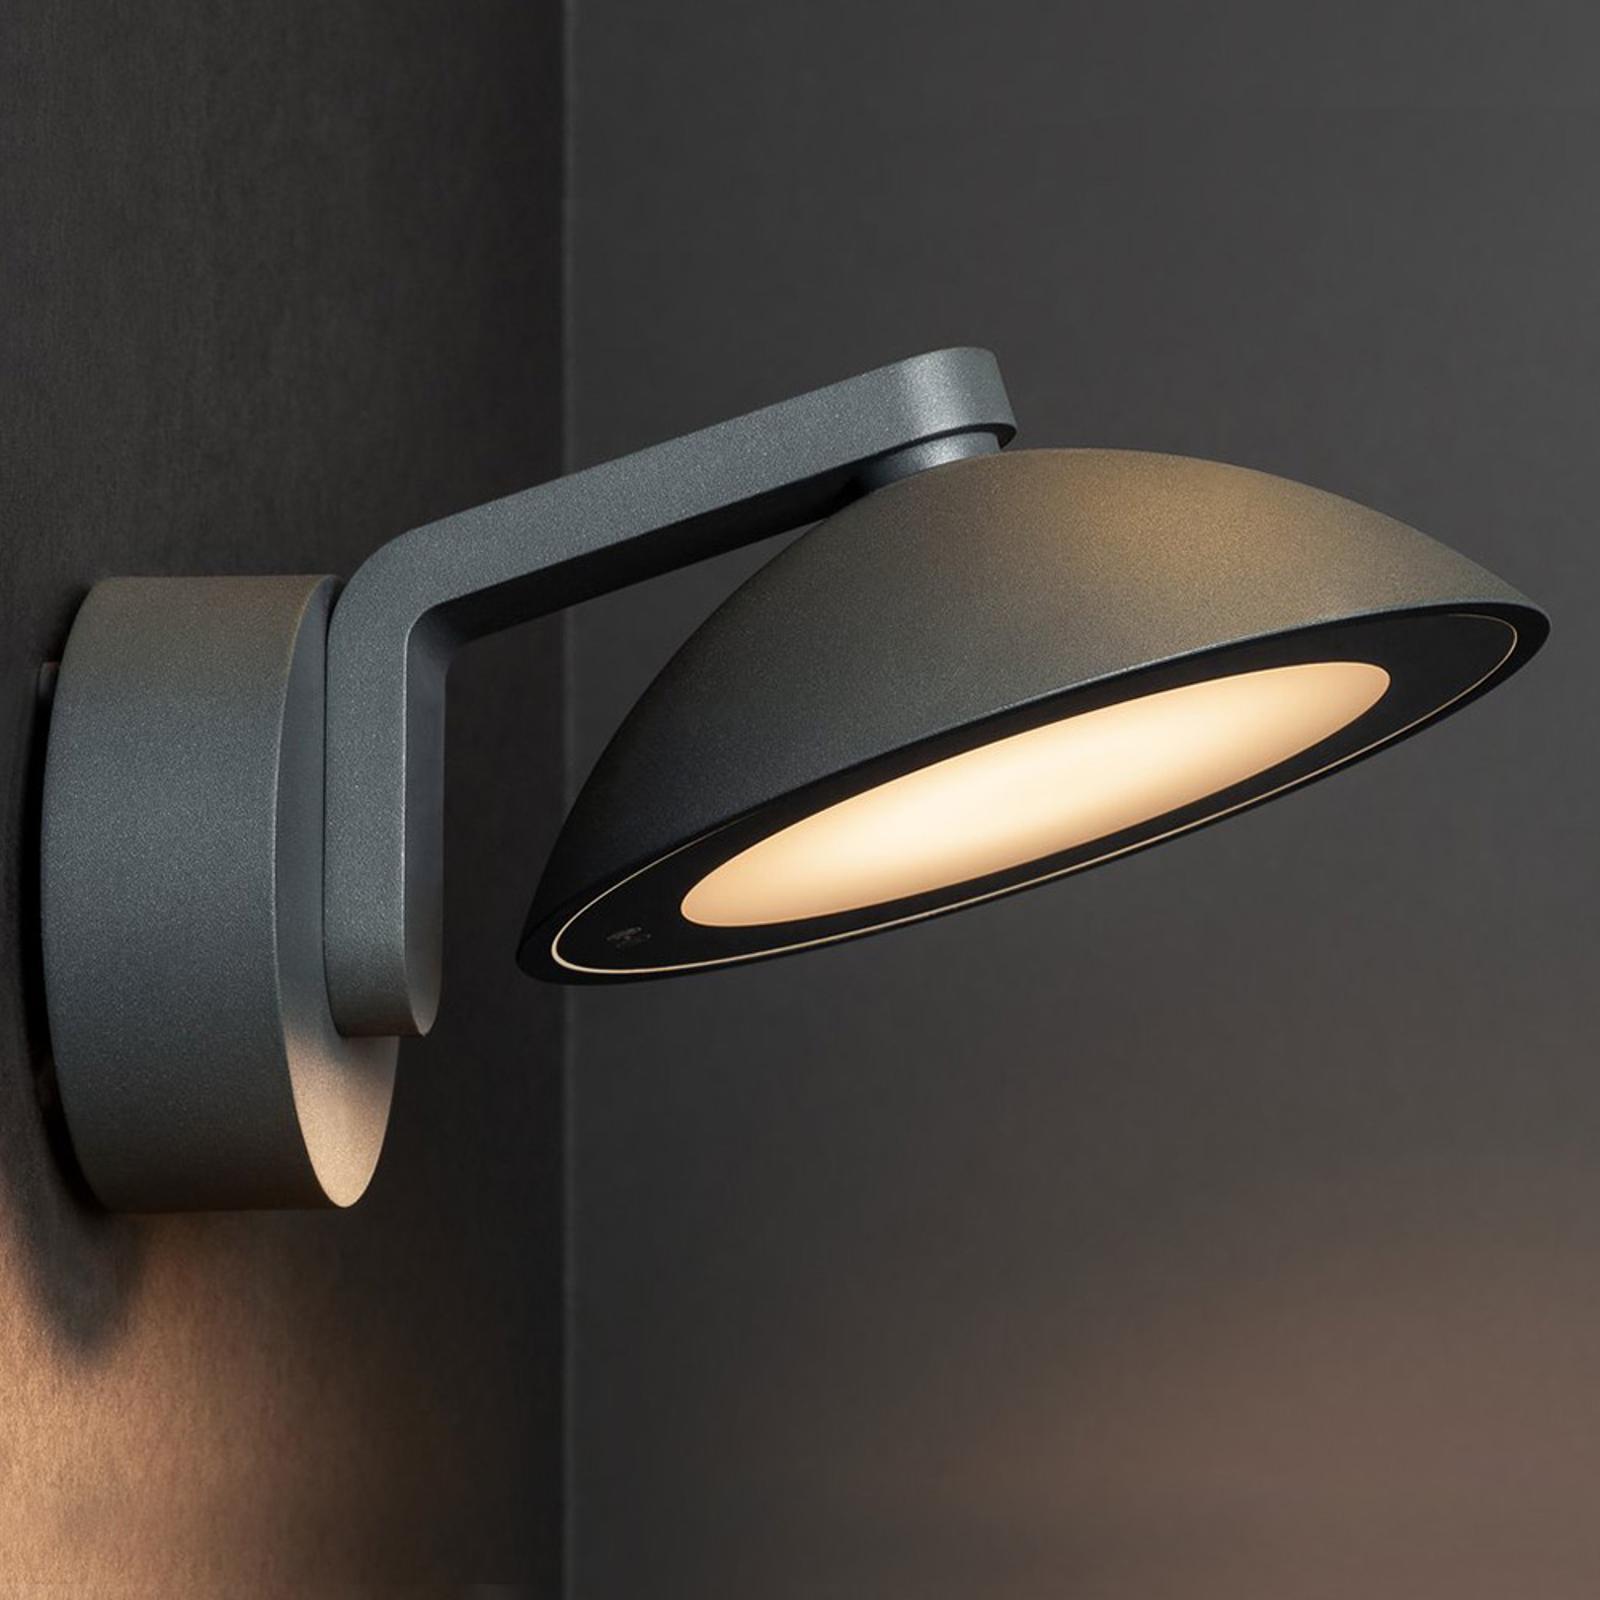 SLV Malu SLV applique da esterni LED rotonda